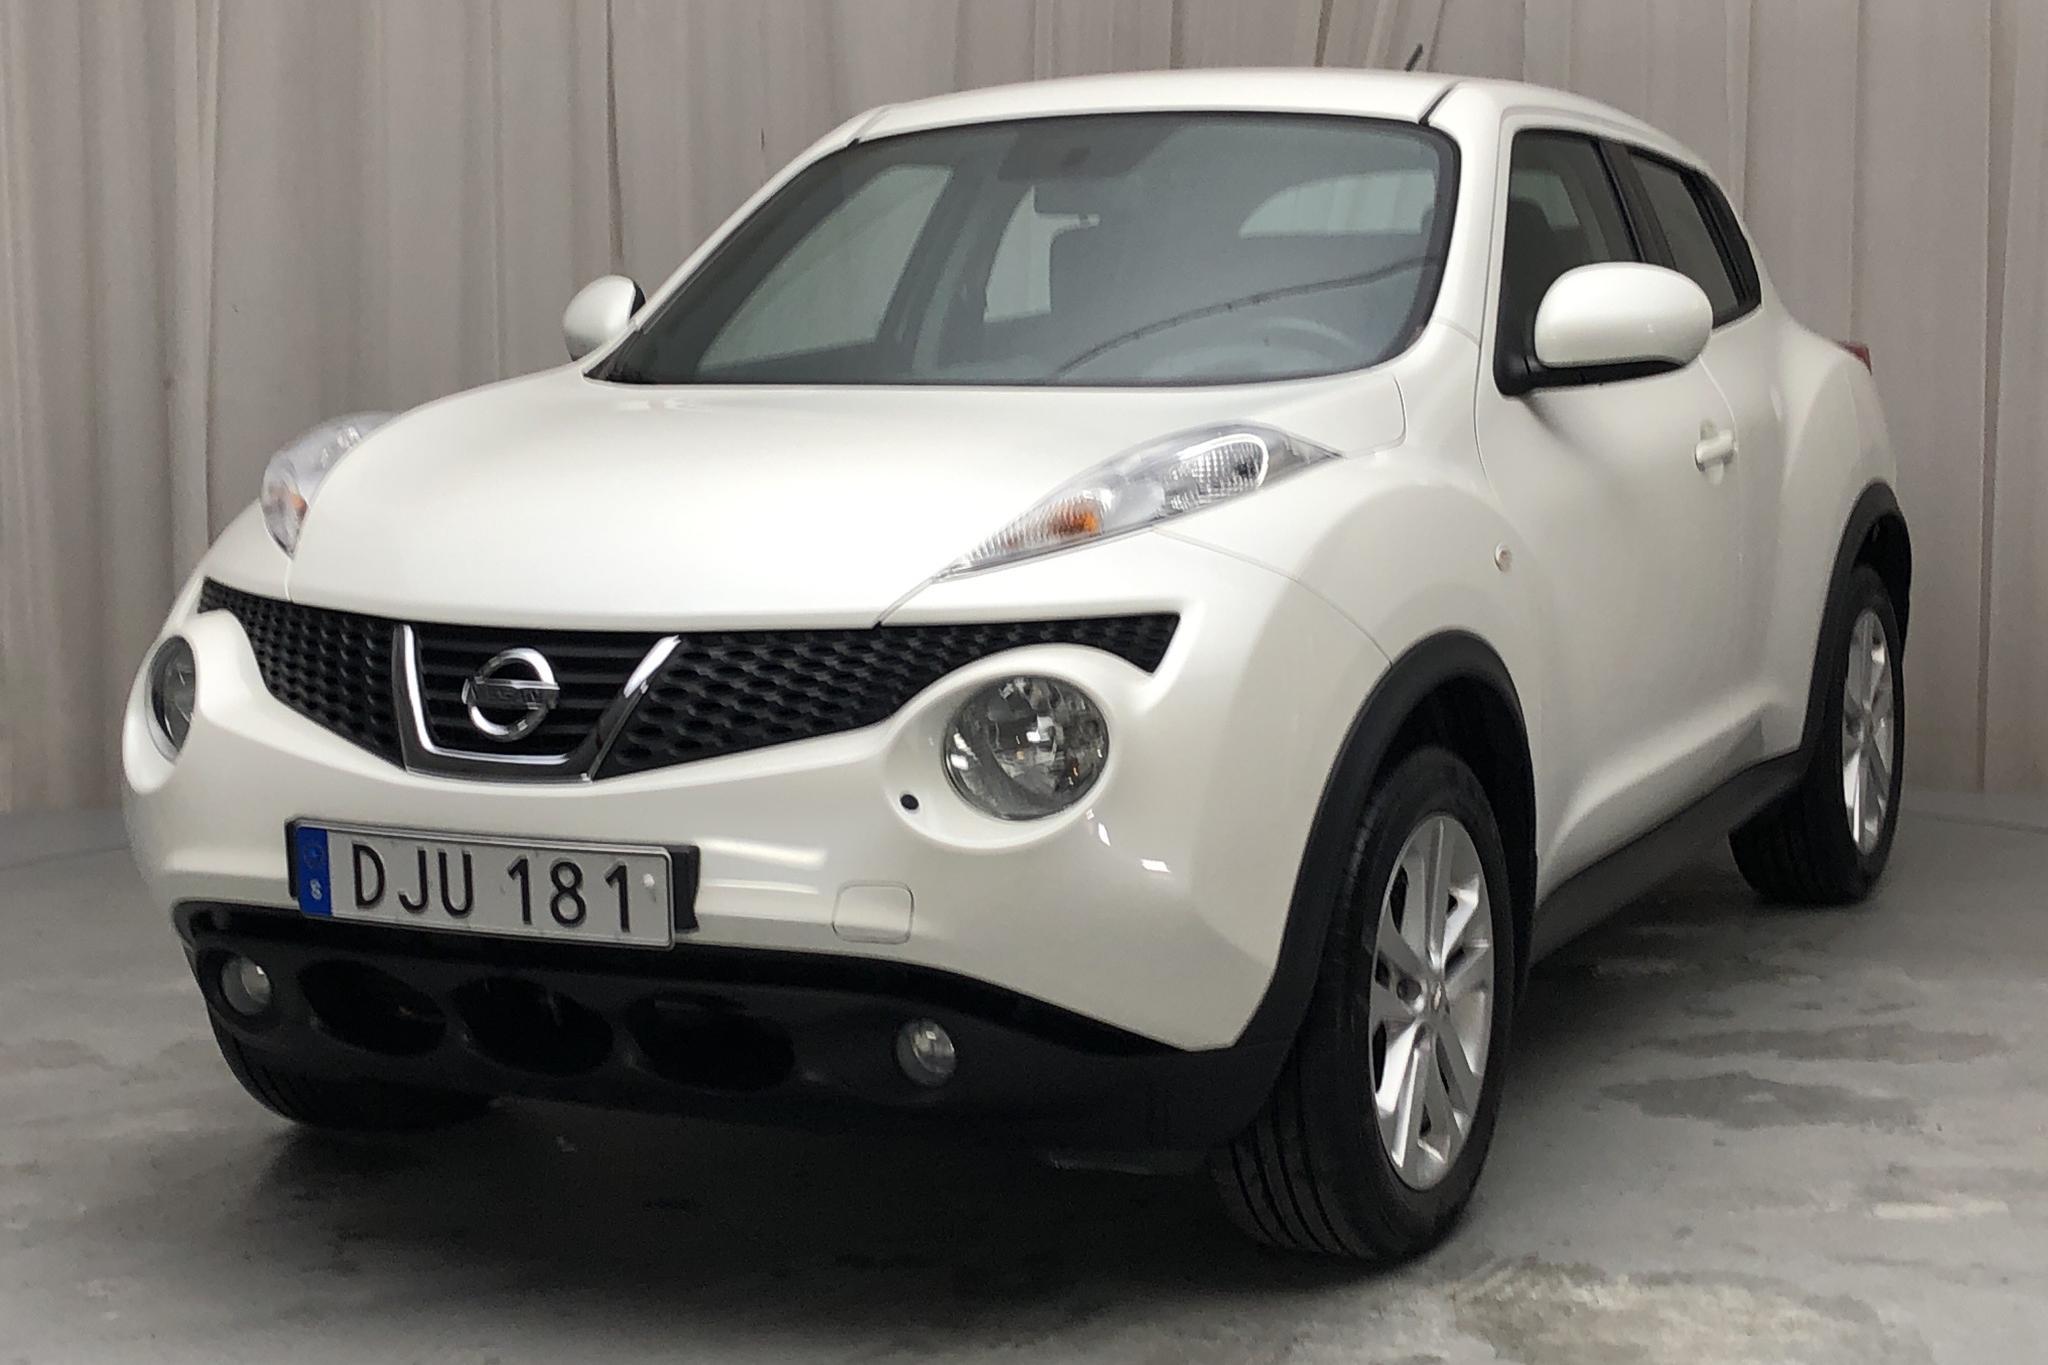 Nissan Juke 1.6 (117hk) - 7 895 mil - Automat - vit - 2014